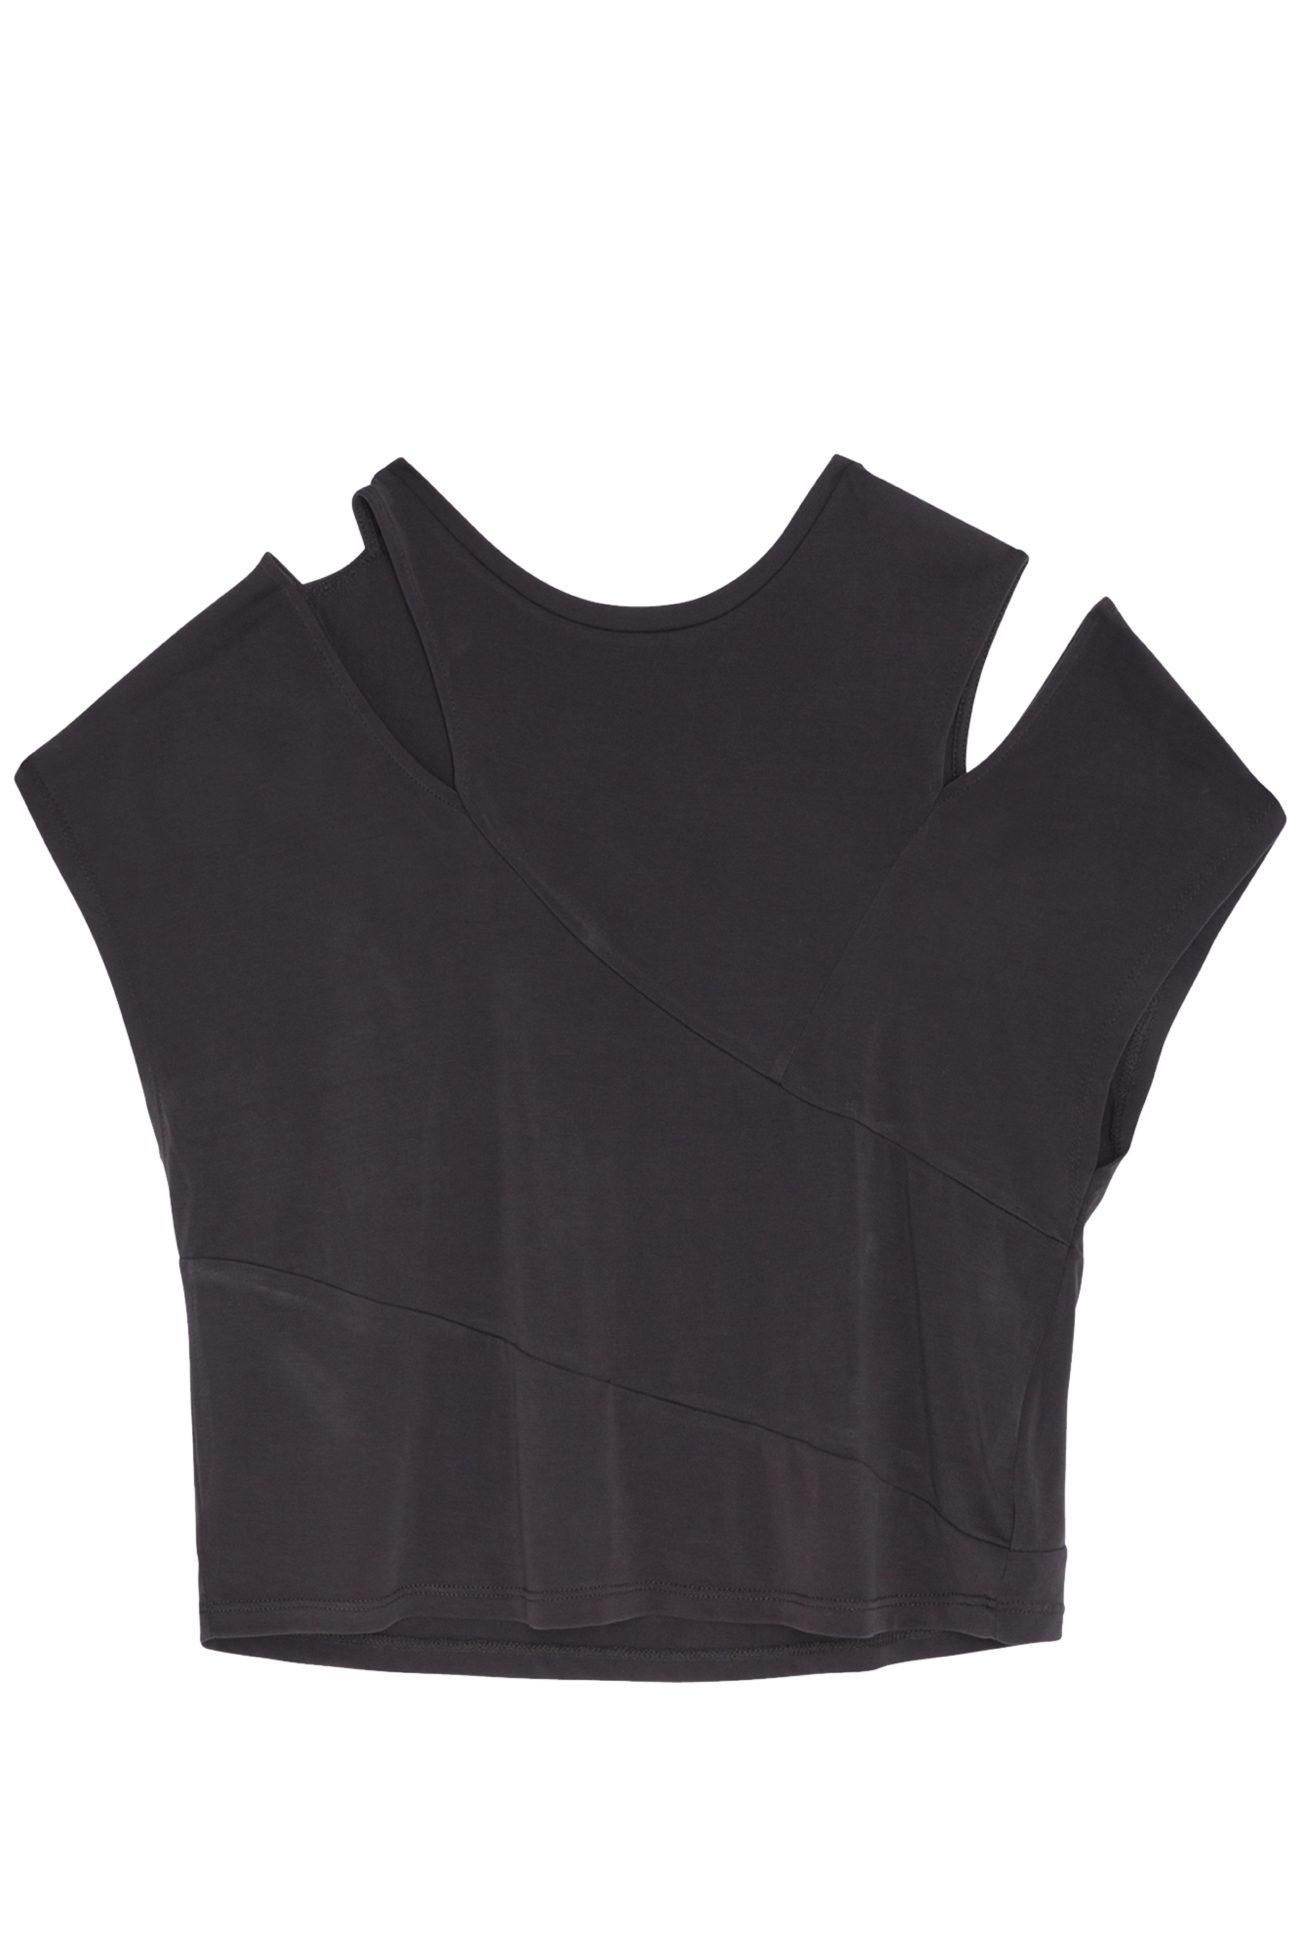 Camiseta de manga corta con aberturas en los hombros (15.99 euros).